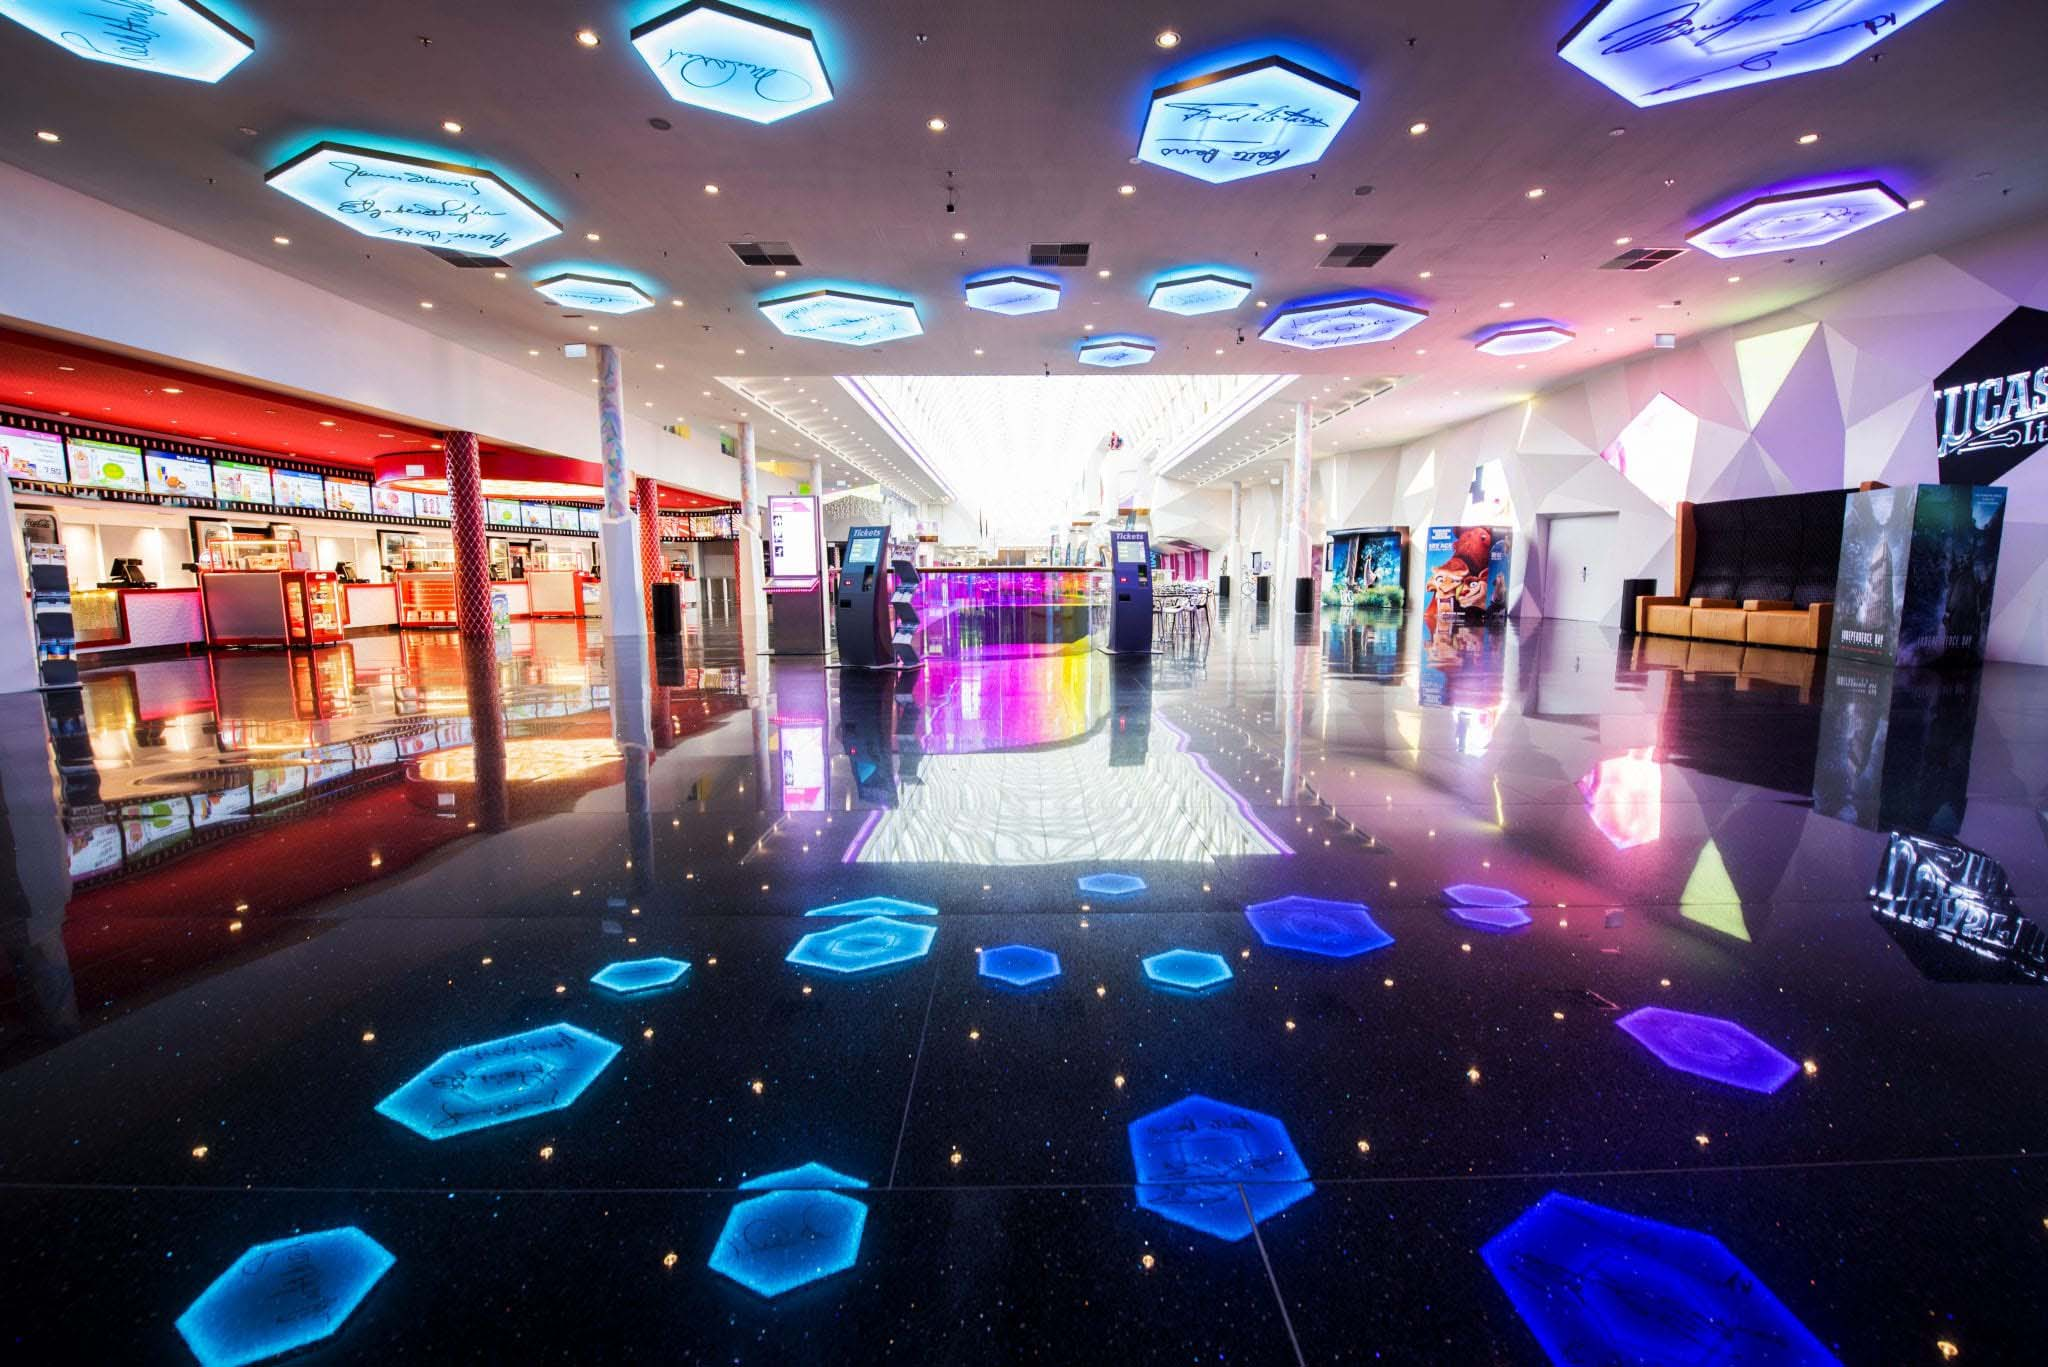 Pluscity, First Class Shopping in Pluscity, Linz, Austria